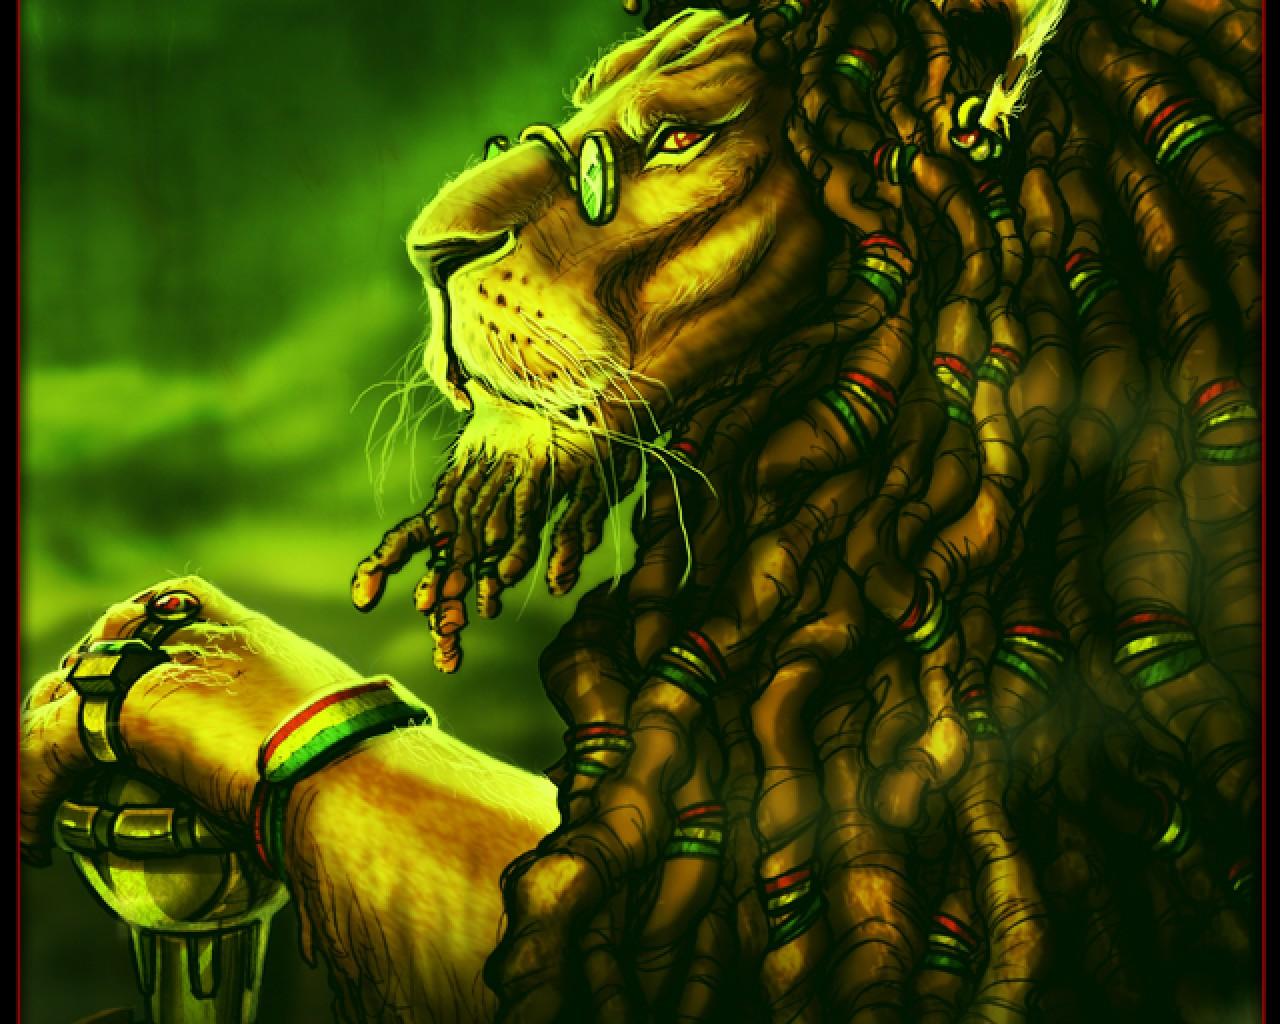 Rasta Lion Hd Wallpaper Rasta Wallpapers HD Wa...